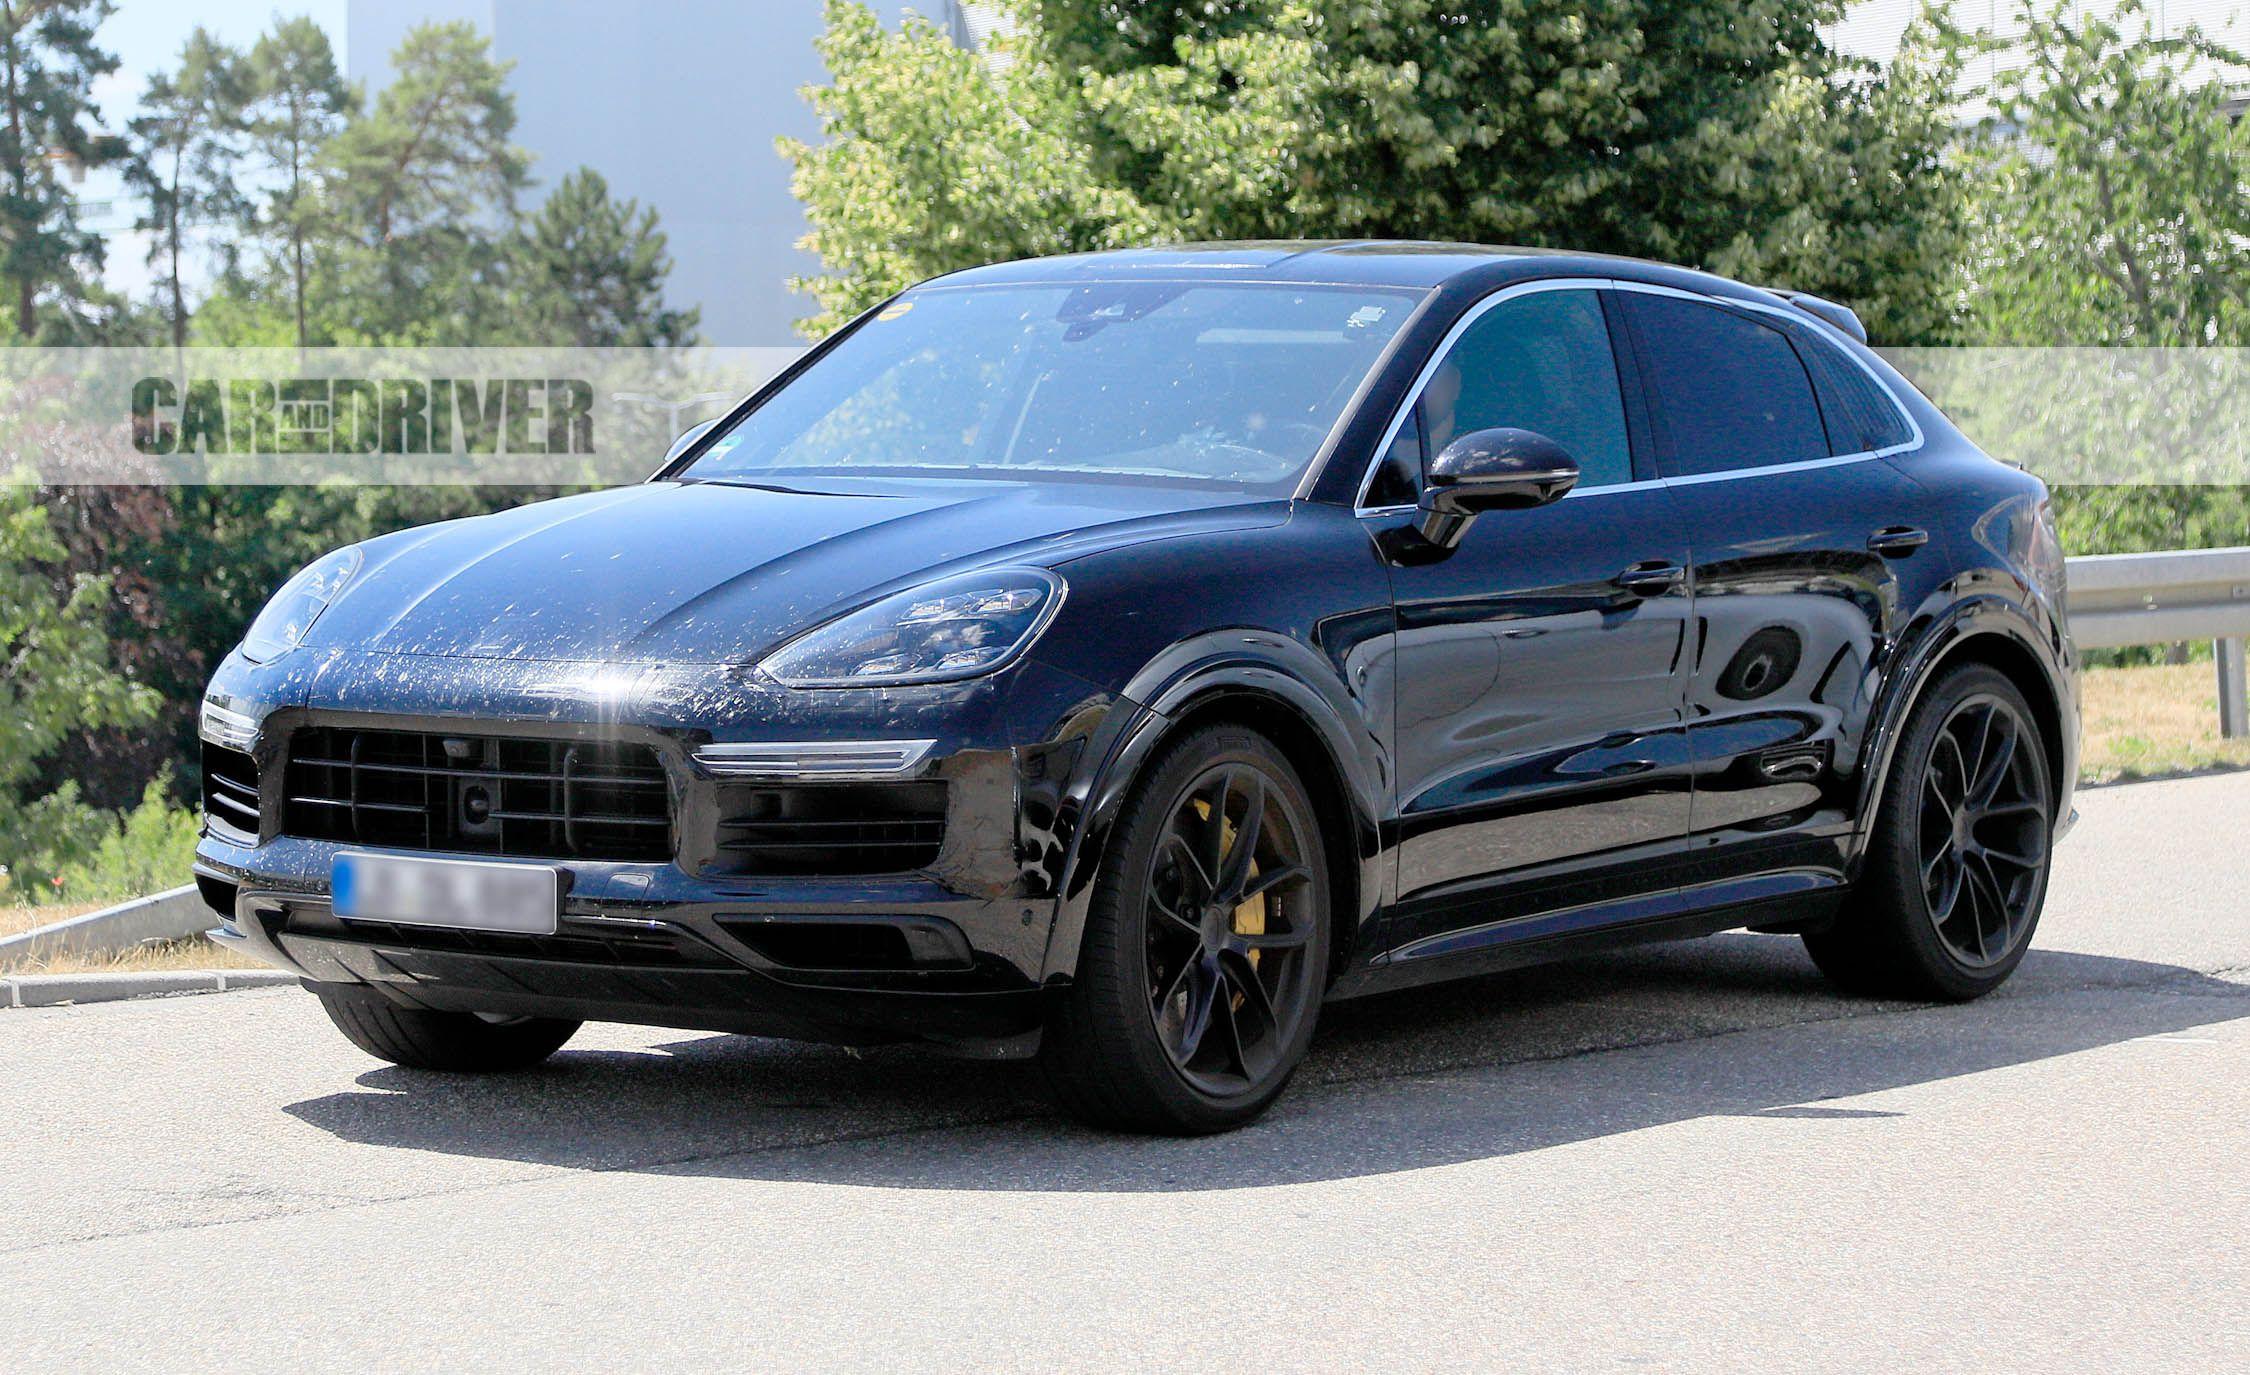 2020 Porsche Cayenne Coupe Version Design Specs >> 2020 Porsche Cayenne Coupe Spied Yep A Fastback Version Is Coming